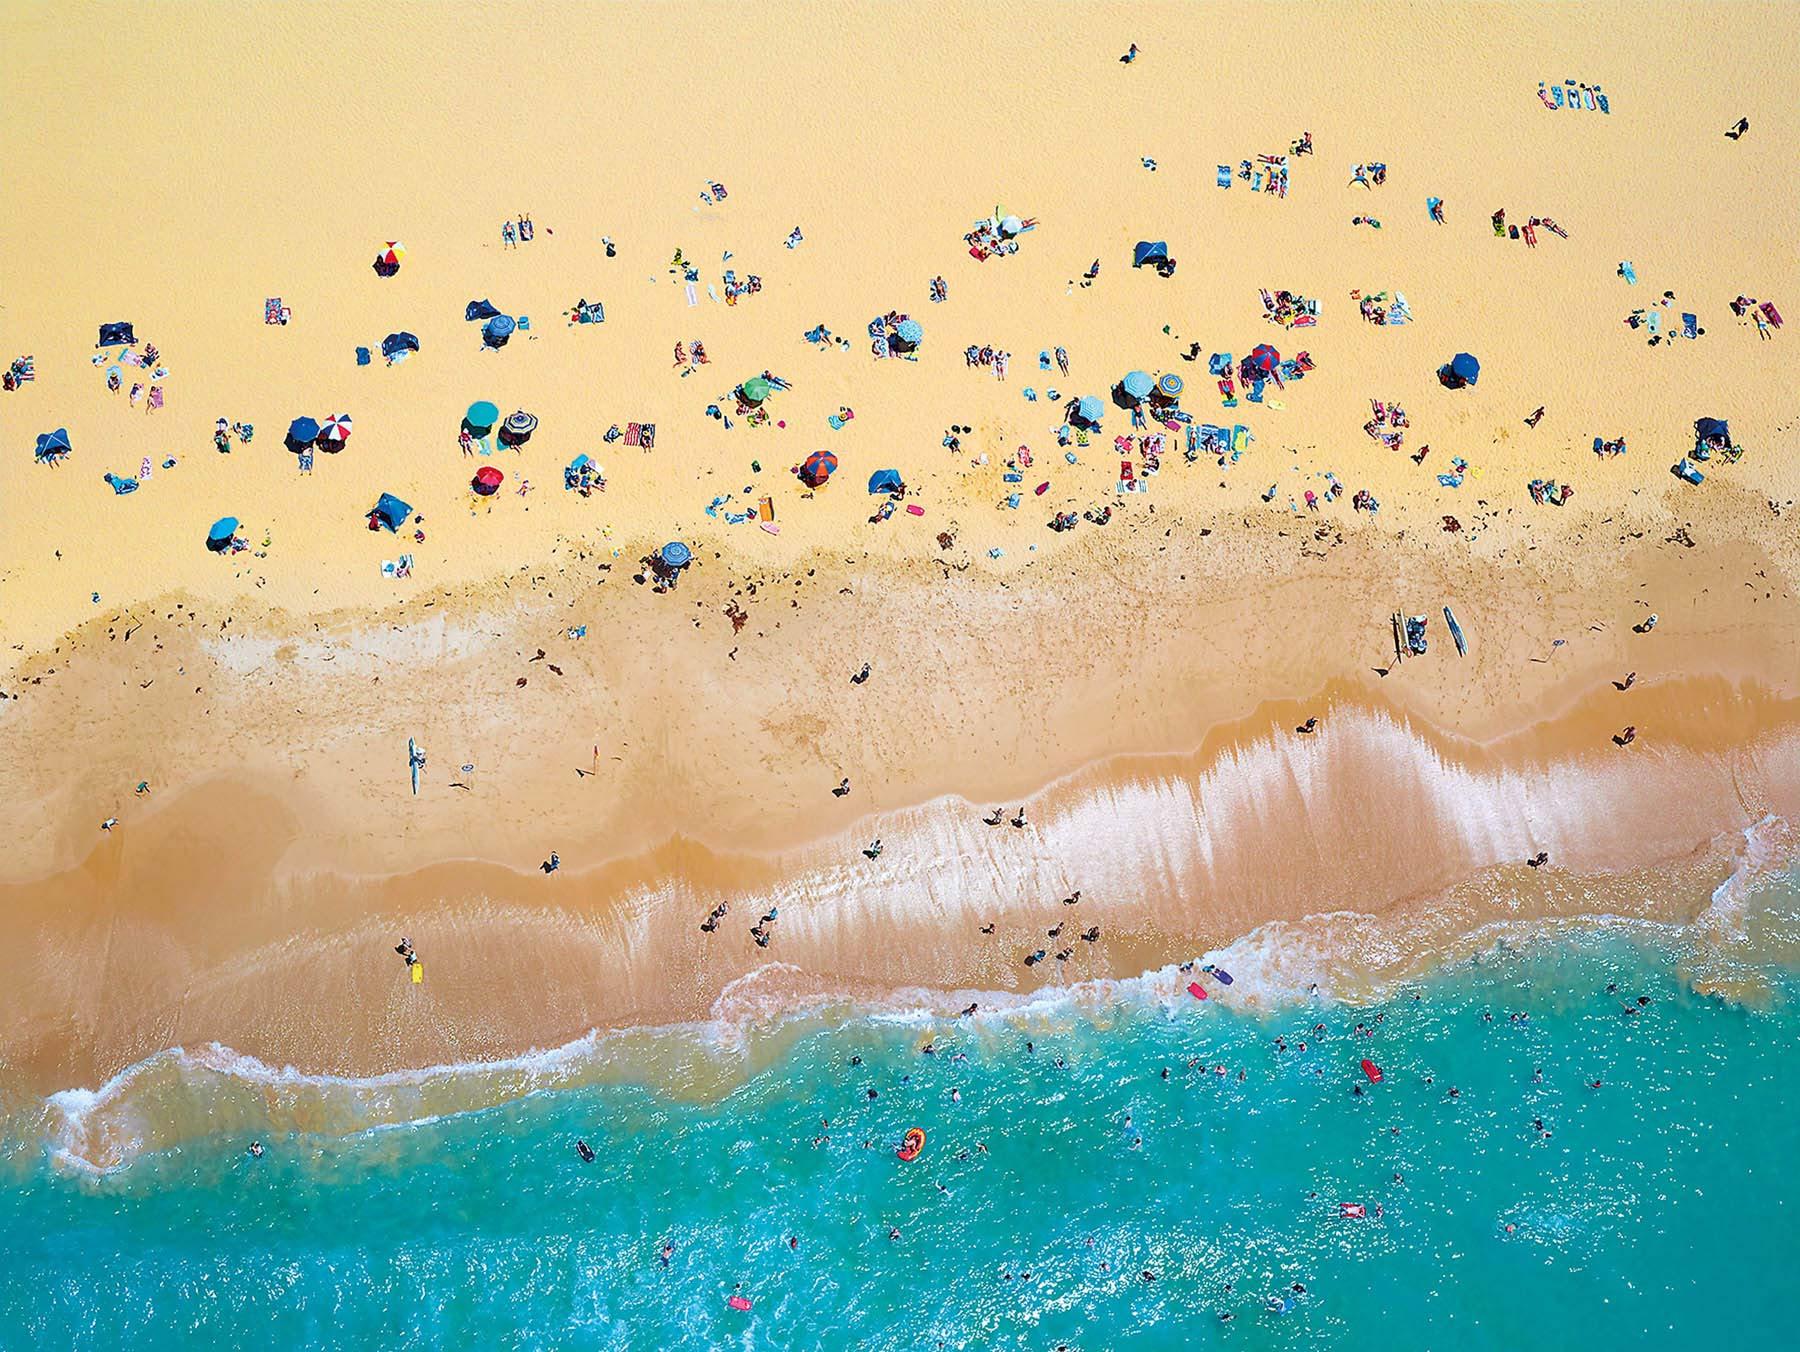 People have fun at the beach, Toowoon Bay, NSW Australia.